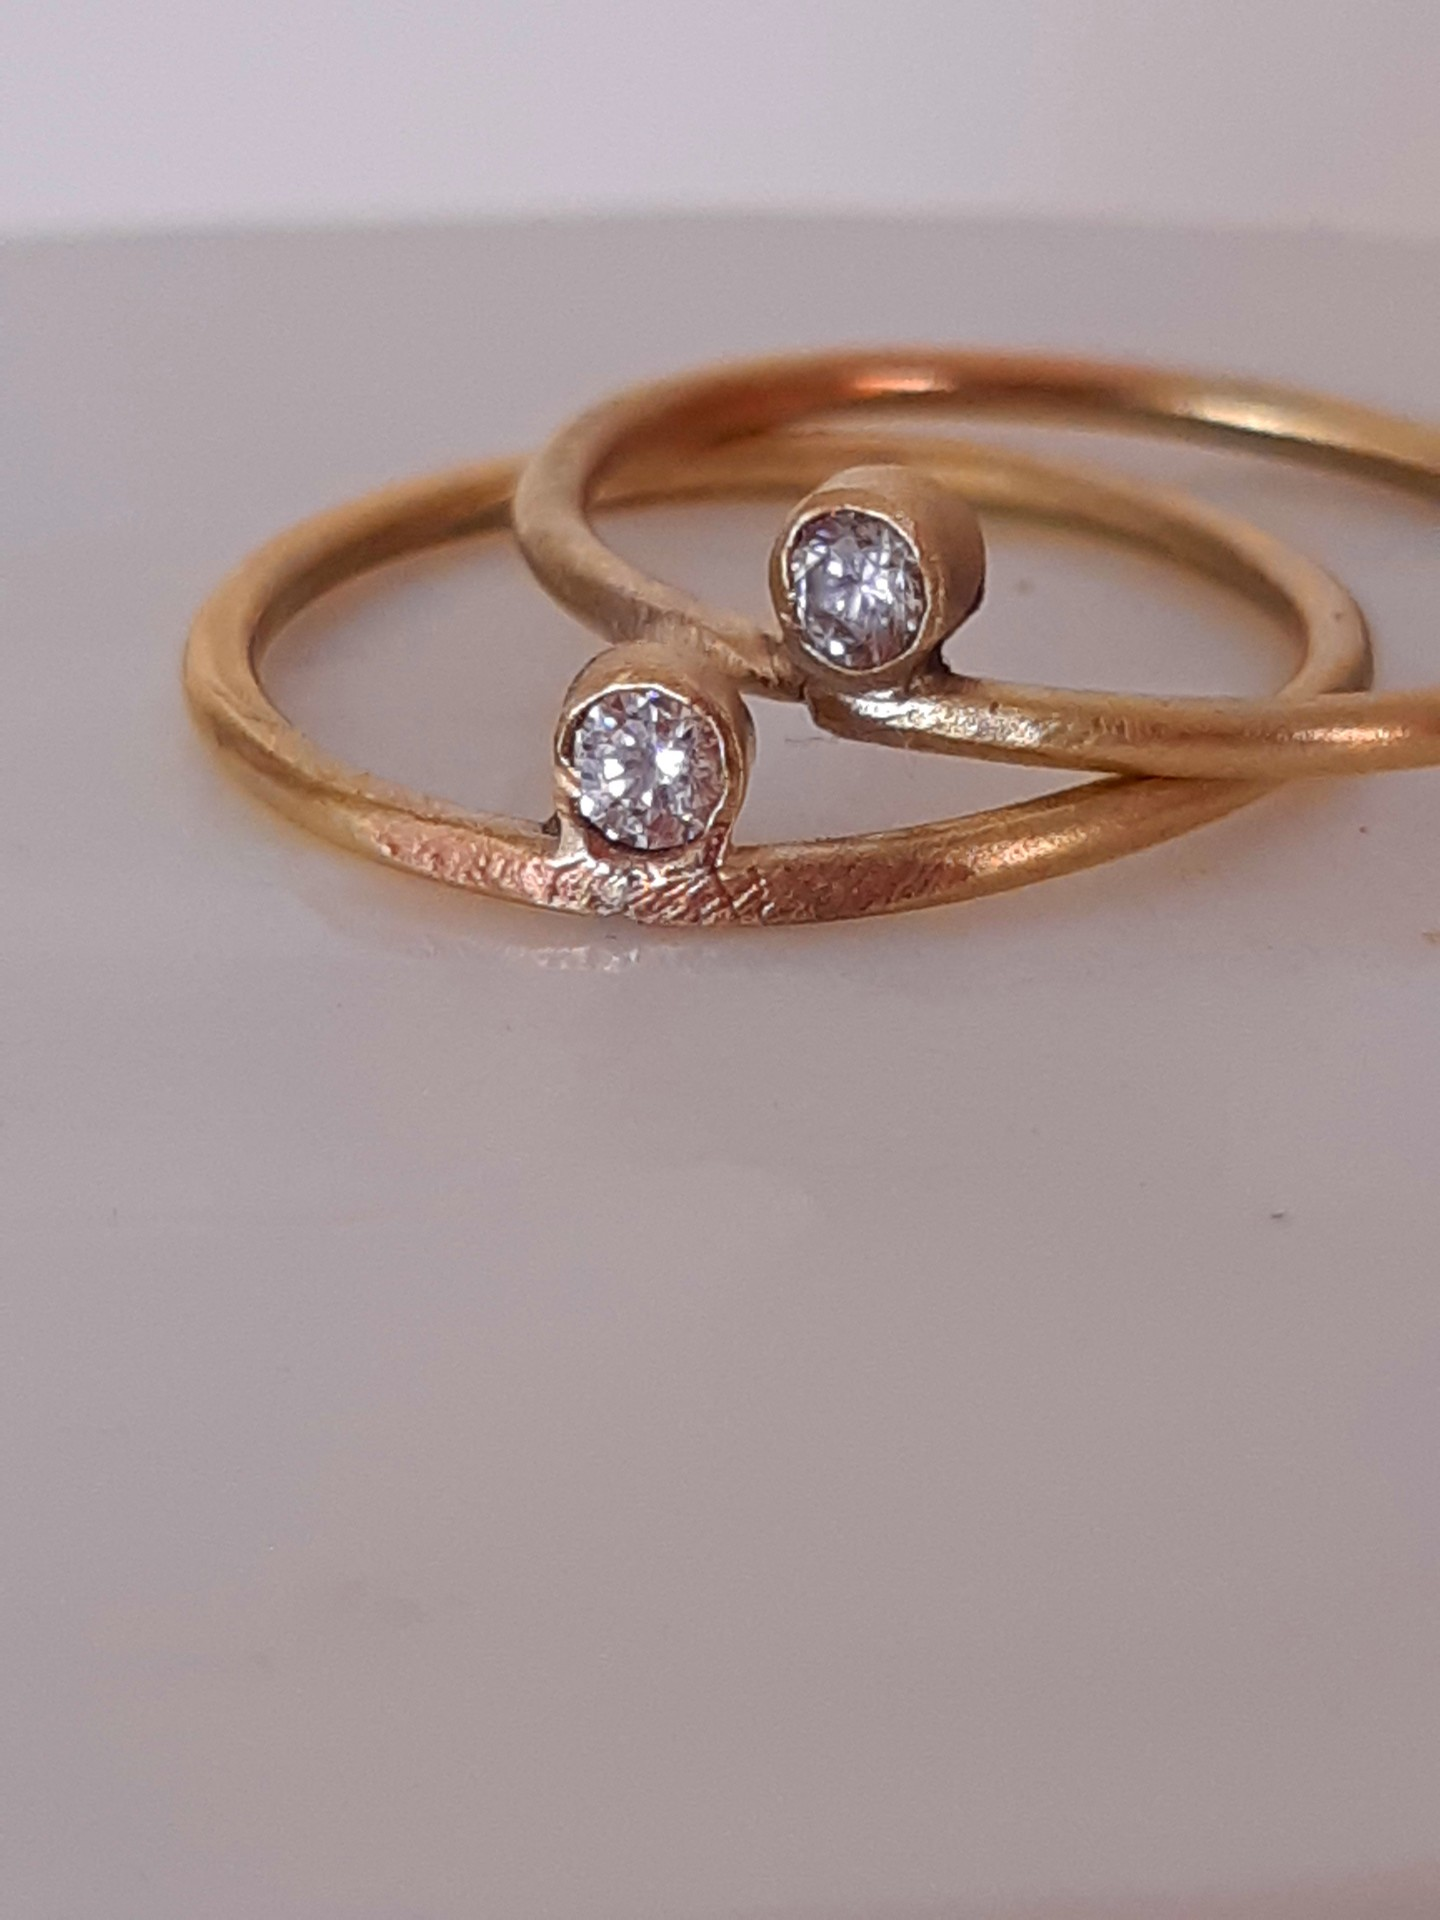 Rigel rings